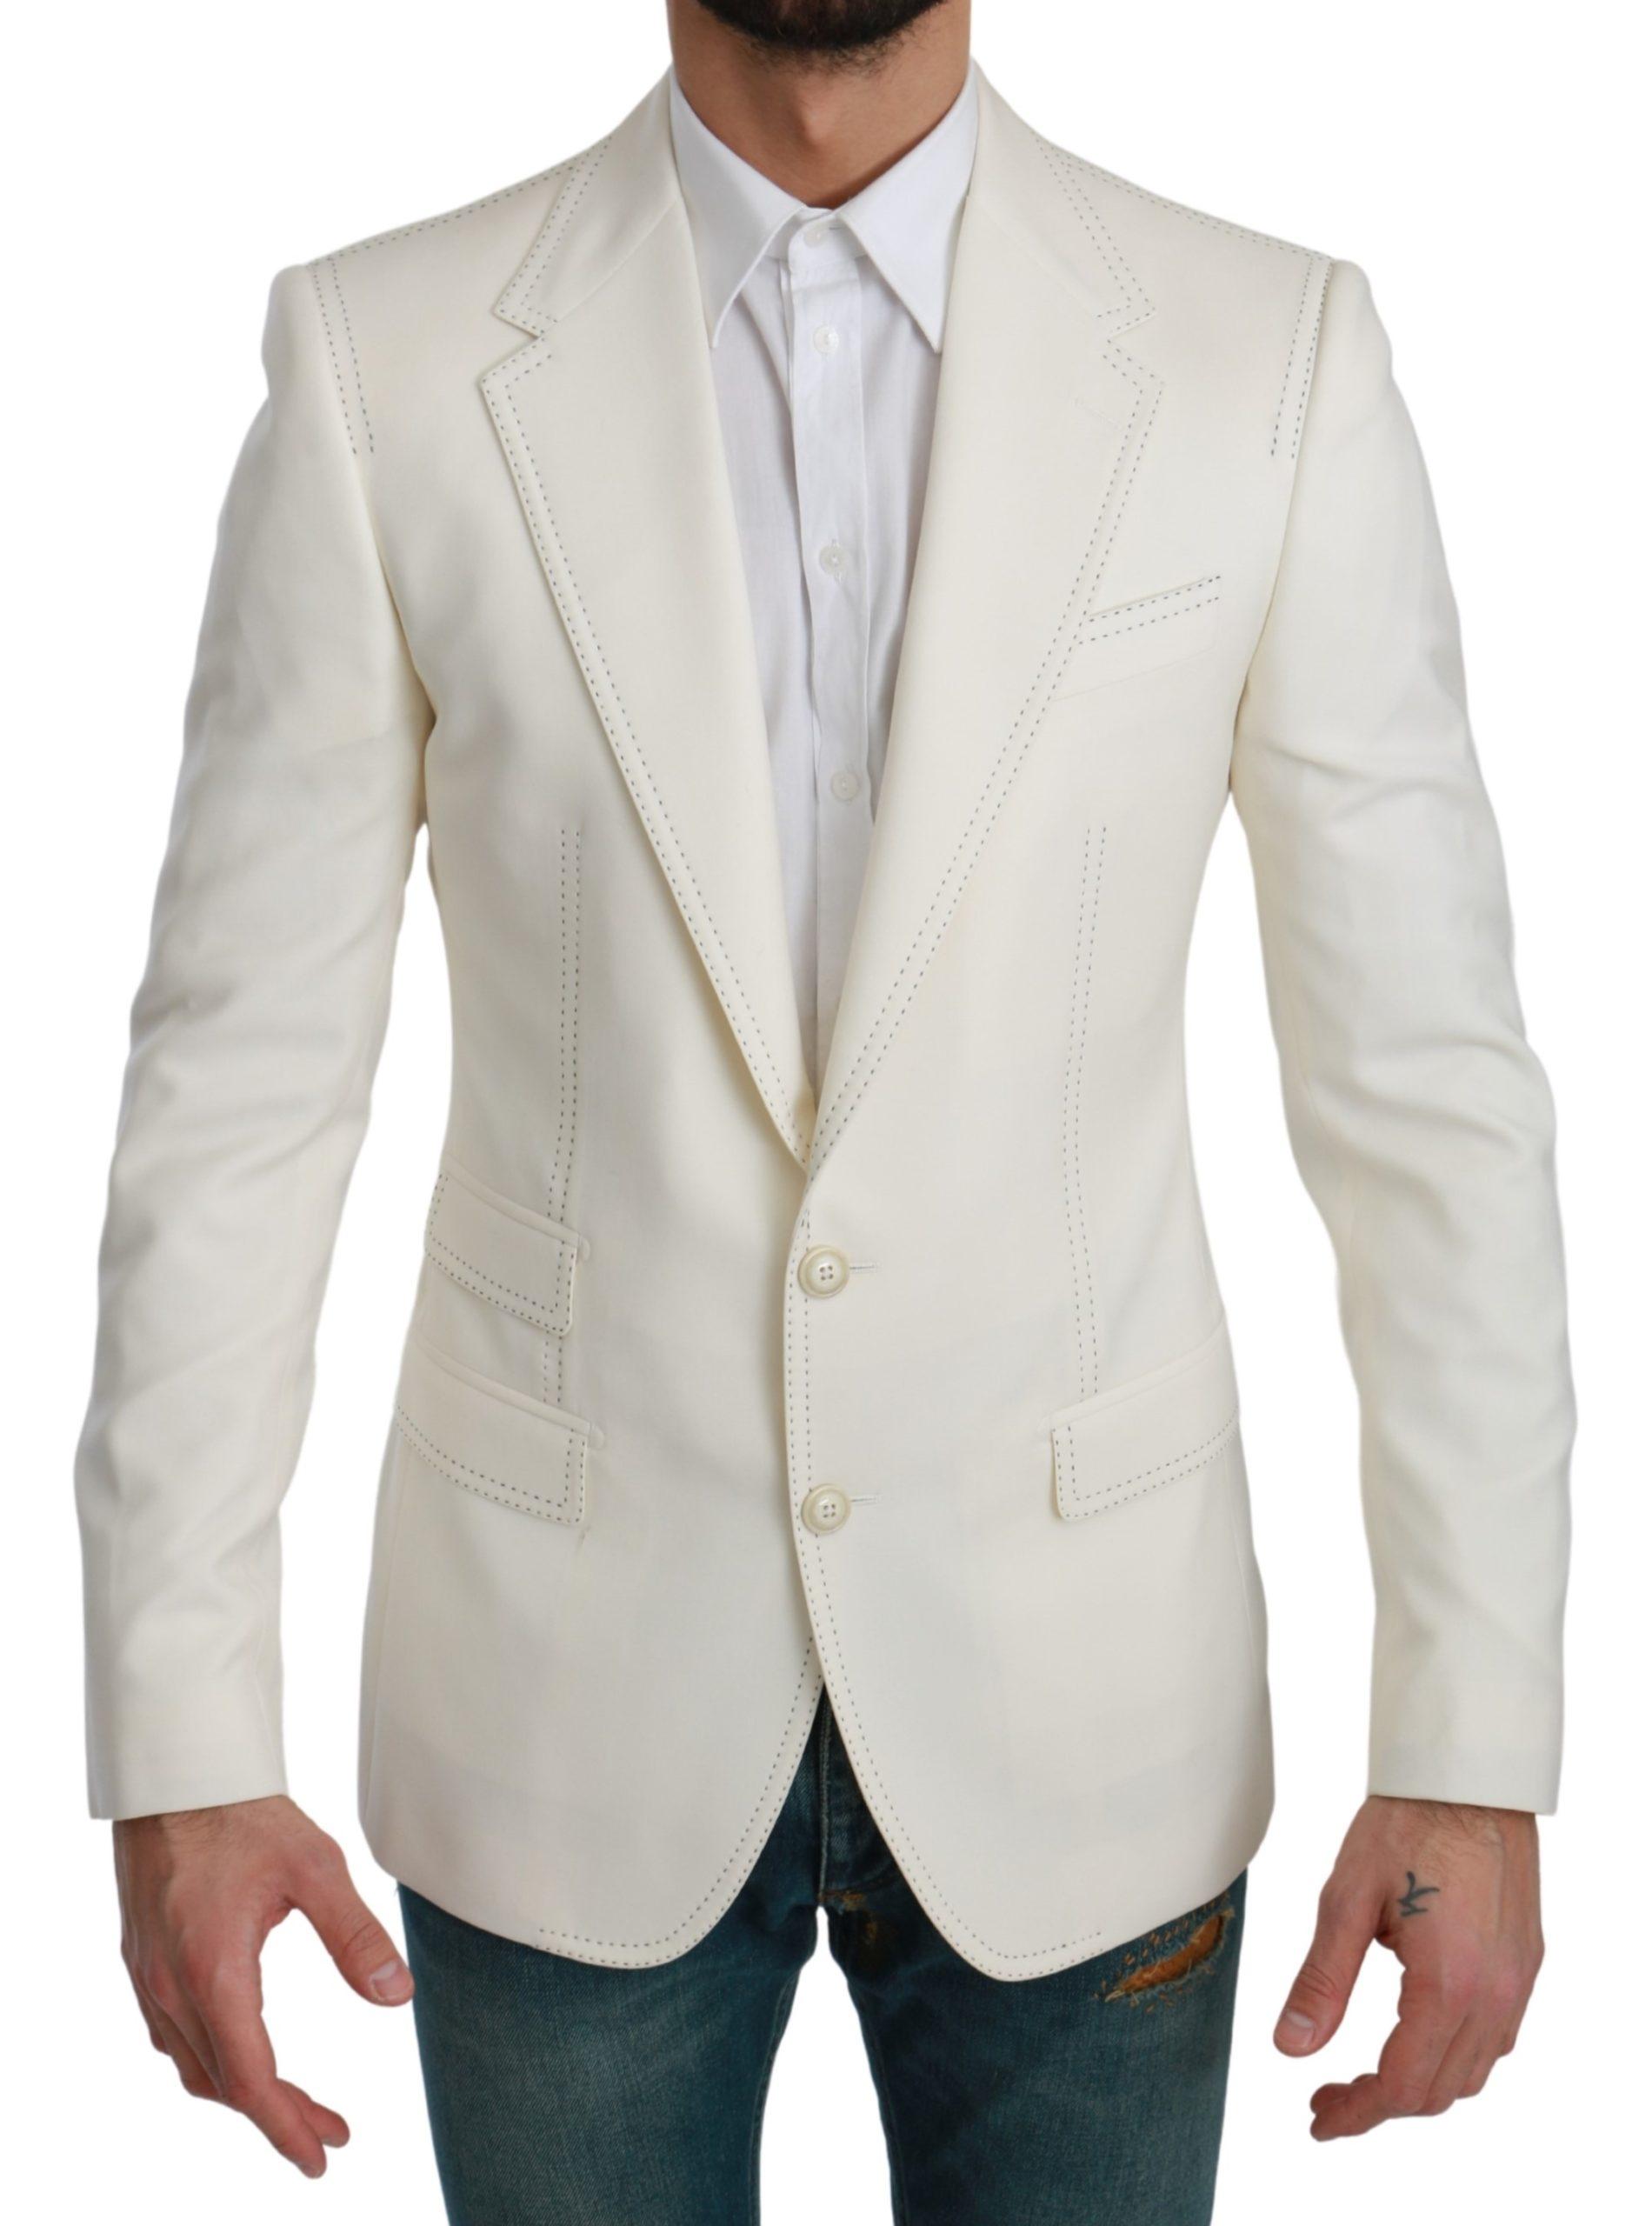 Dolce & Gabbana Men's Single Breasted Formal Blazer White KOS1708 - IT46   S